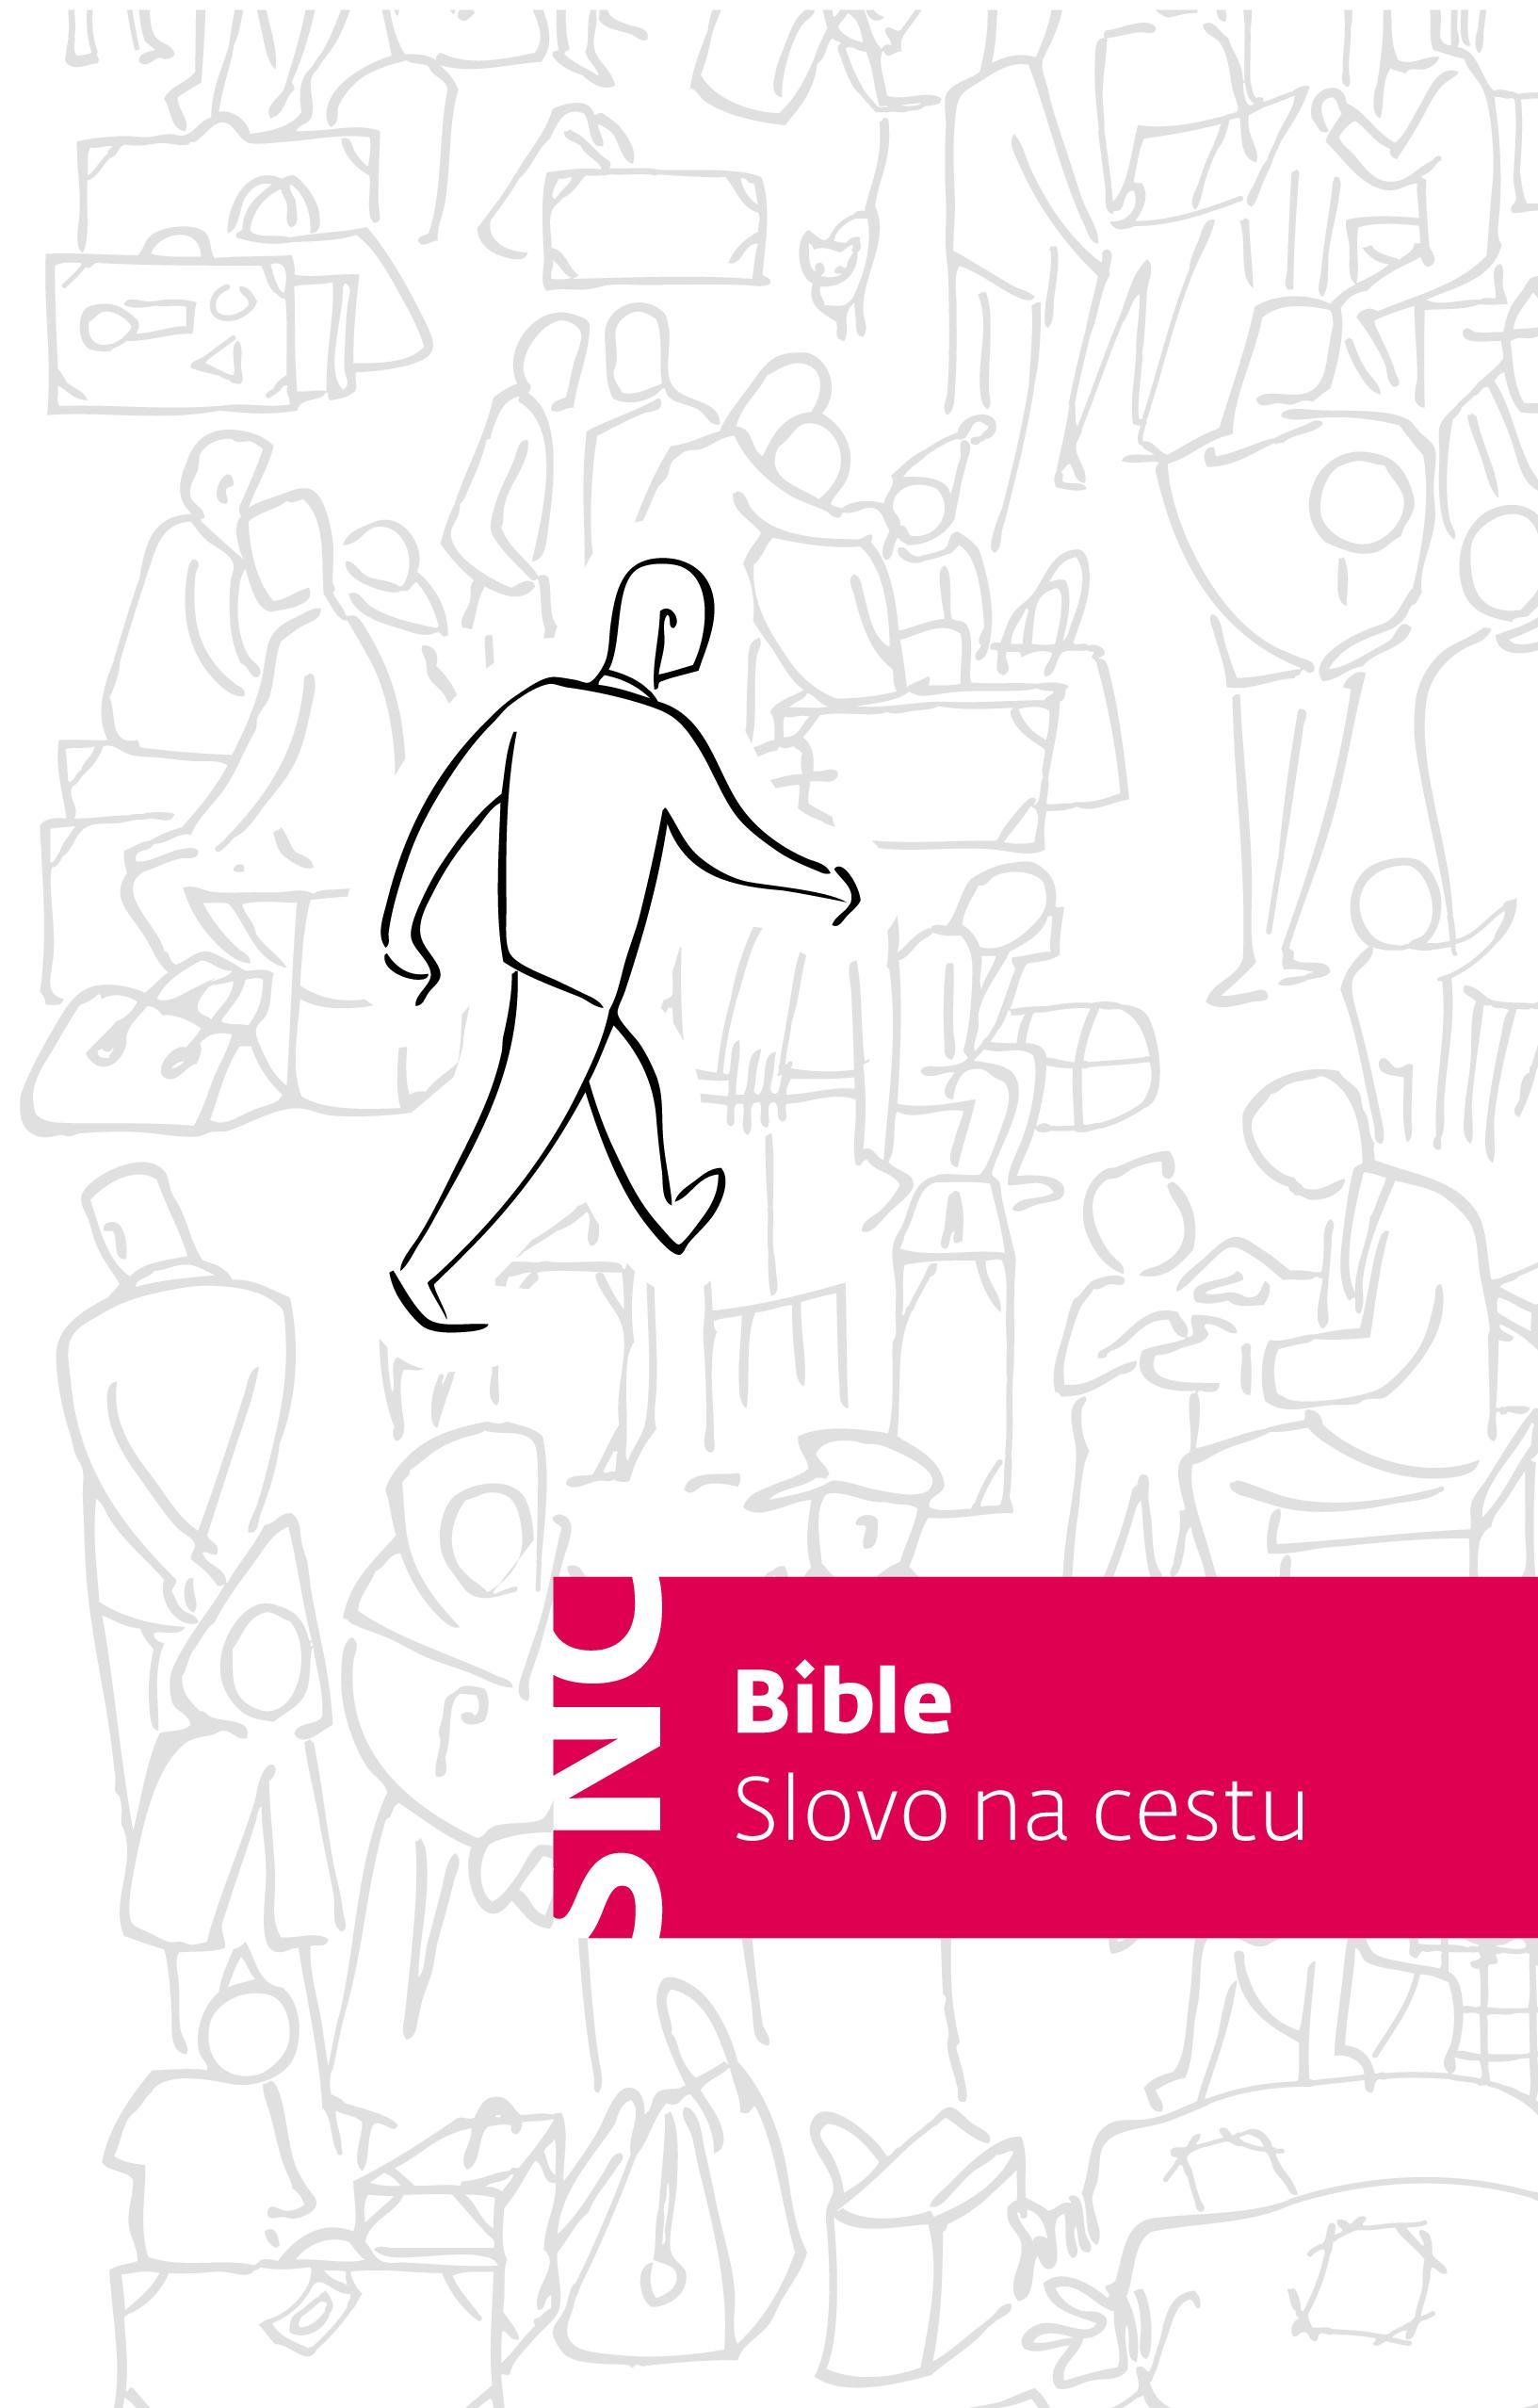 Slovo na cestu - Bible s ilustracemi